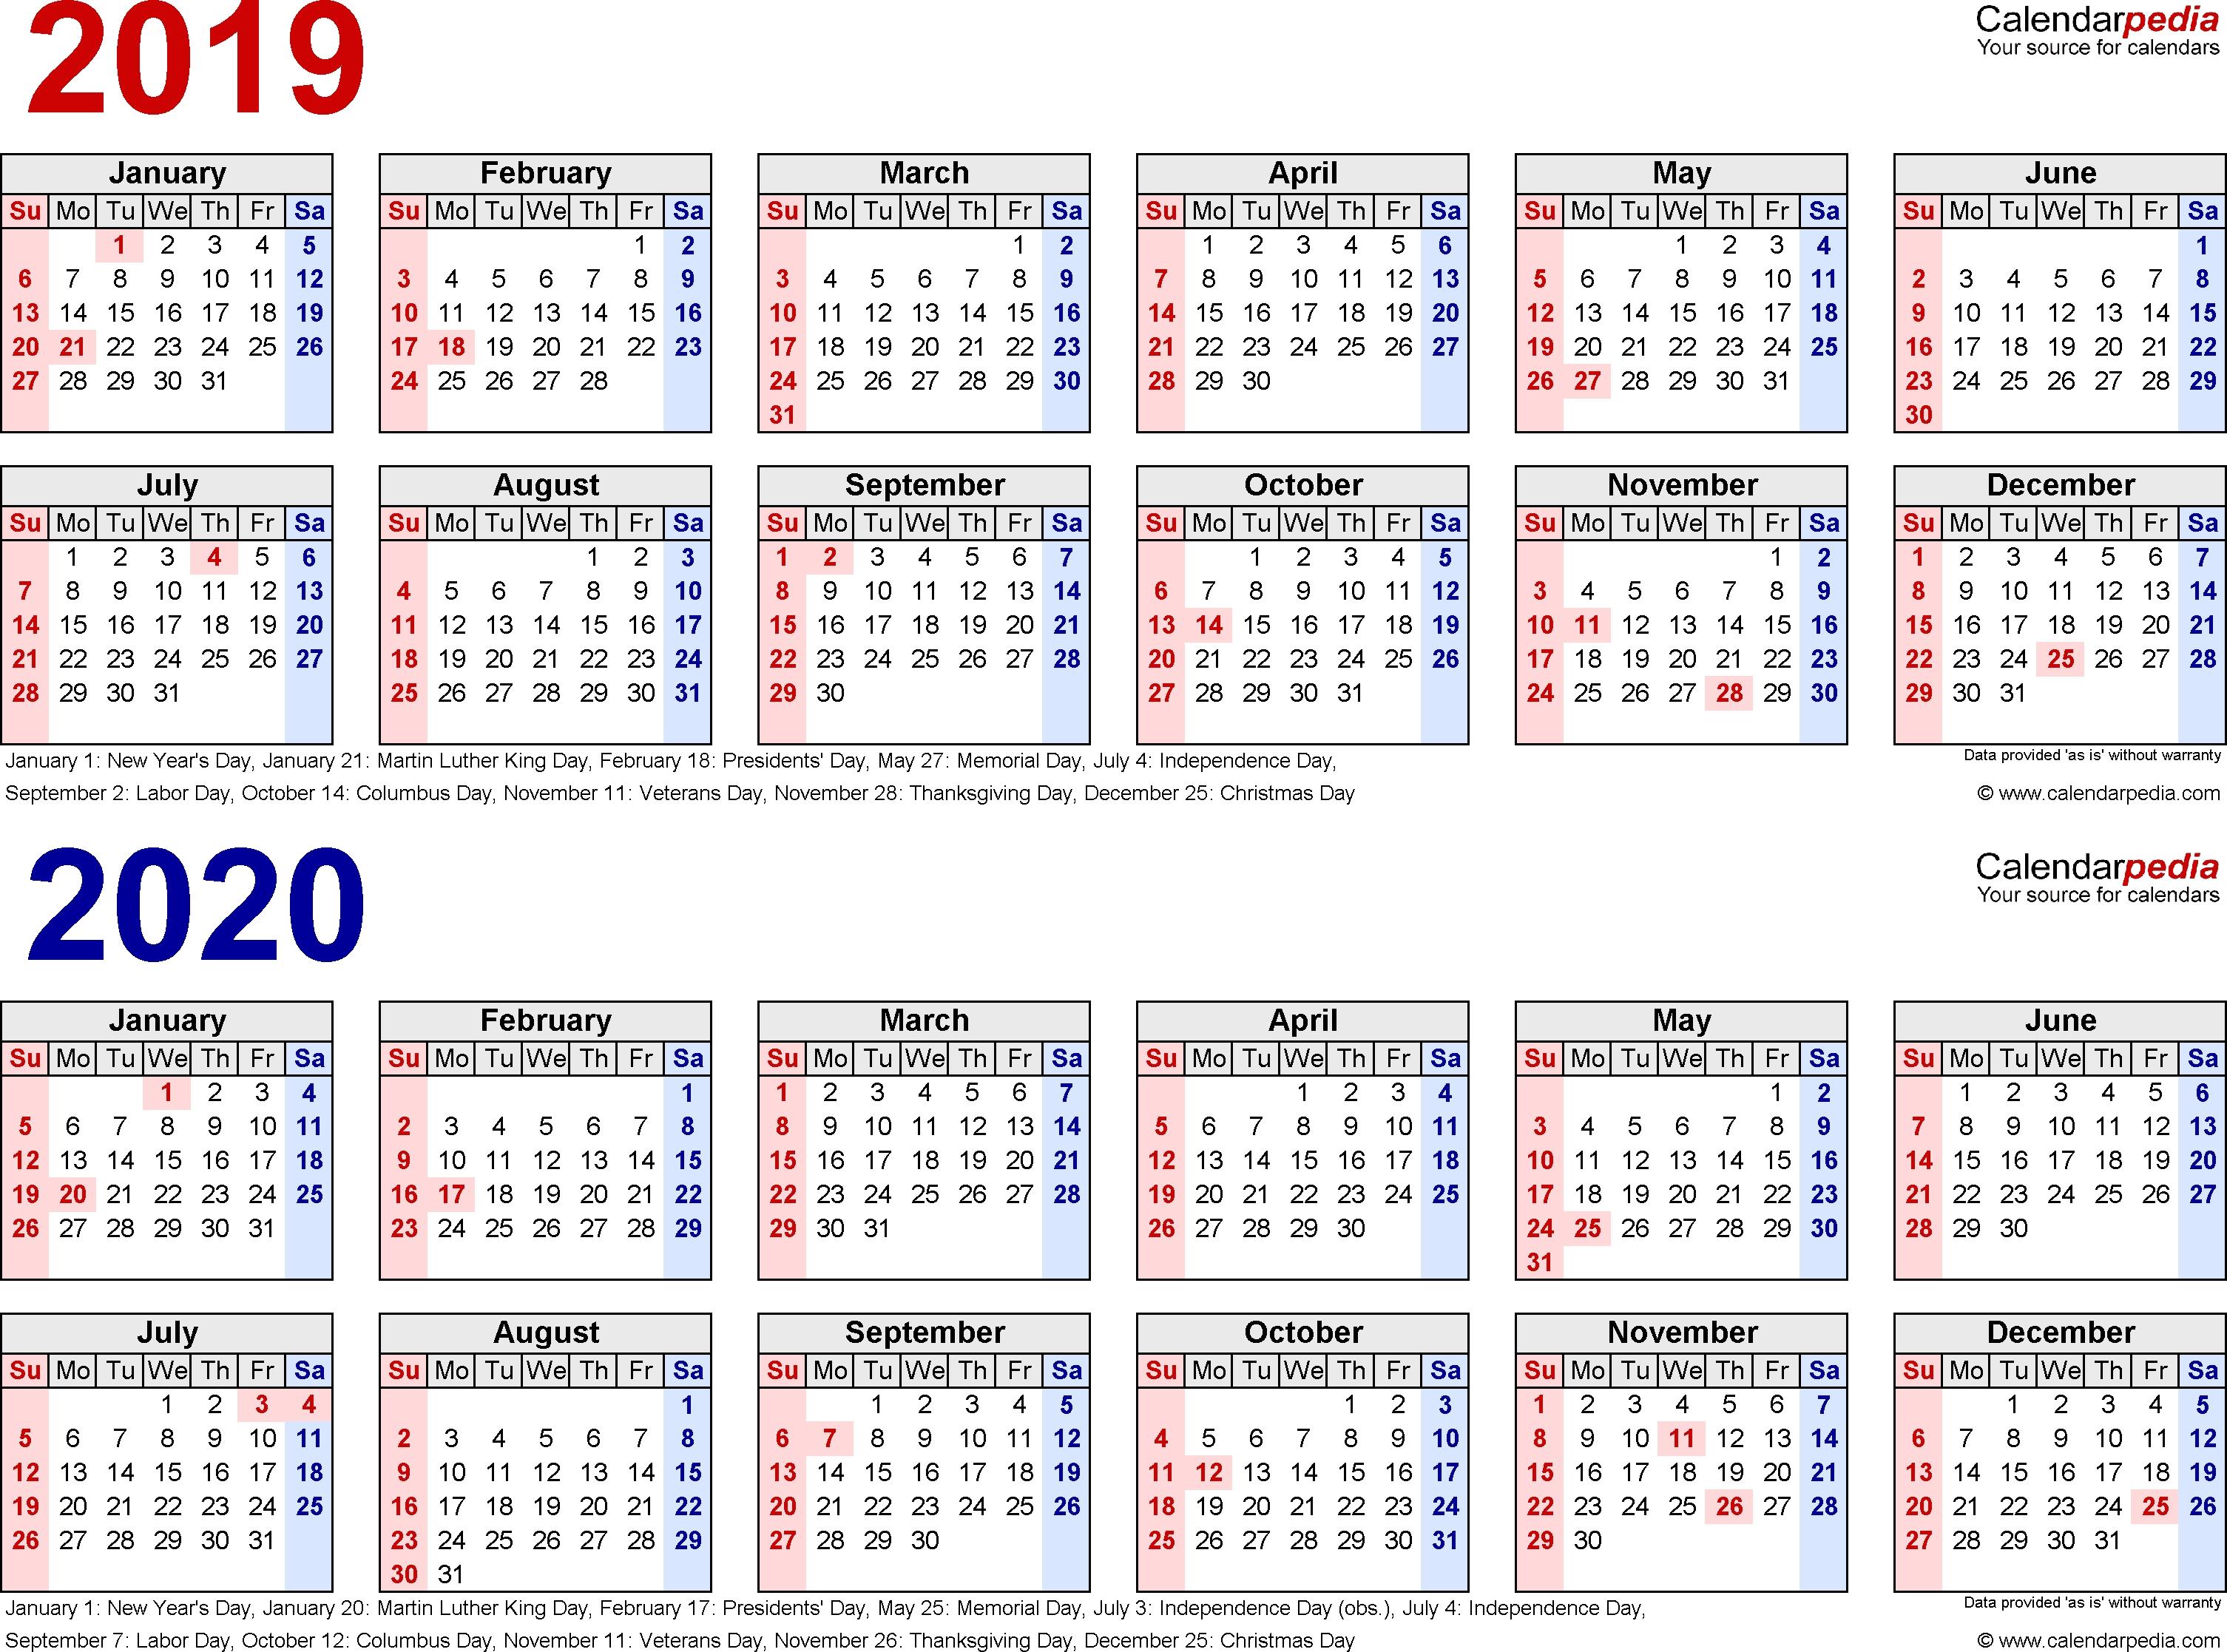 2019-2020 Calendar - Free Printable Two-Year Word Calendars Exceptional 2020 Calendar Template Word